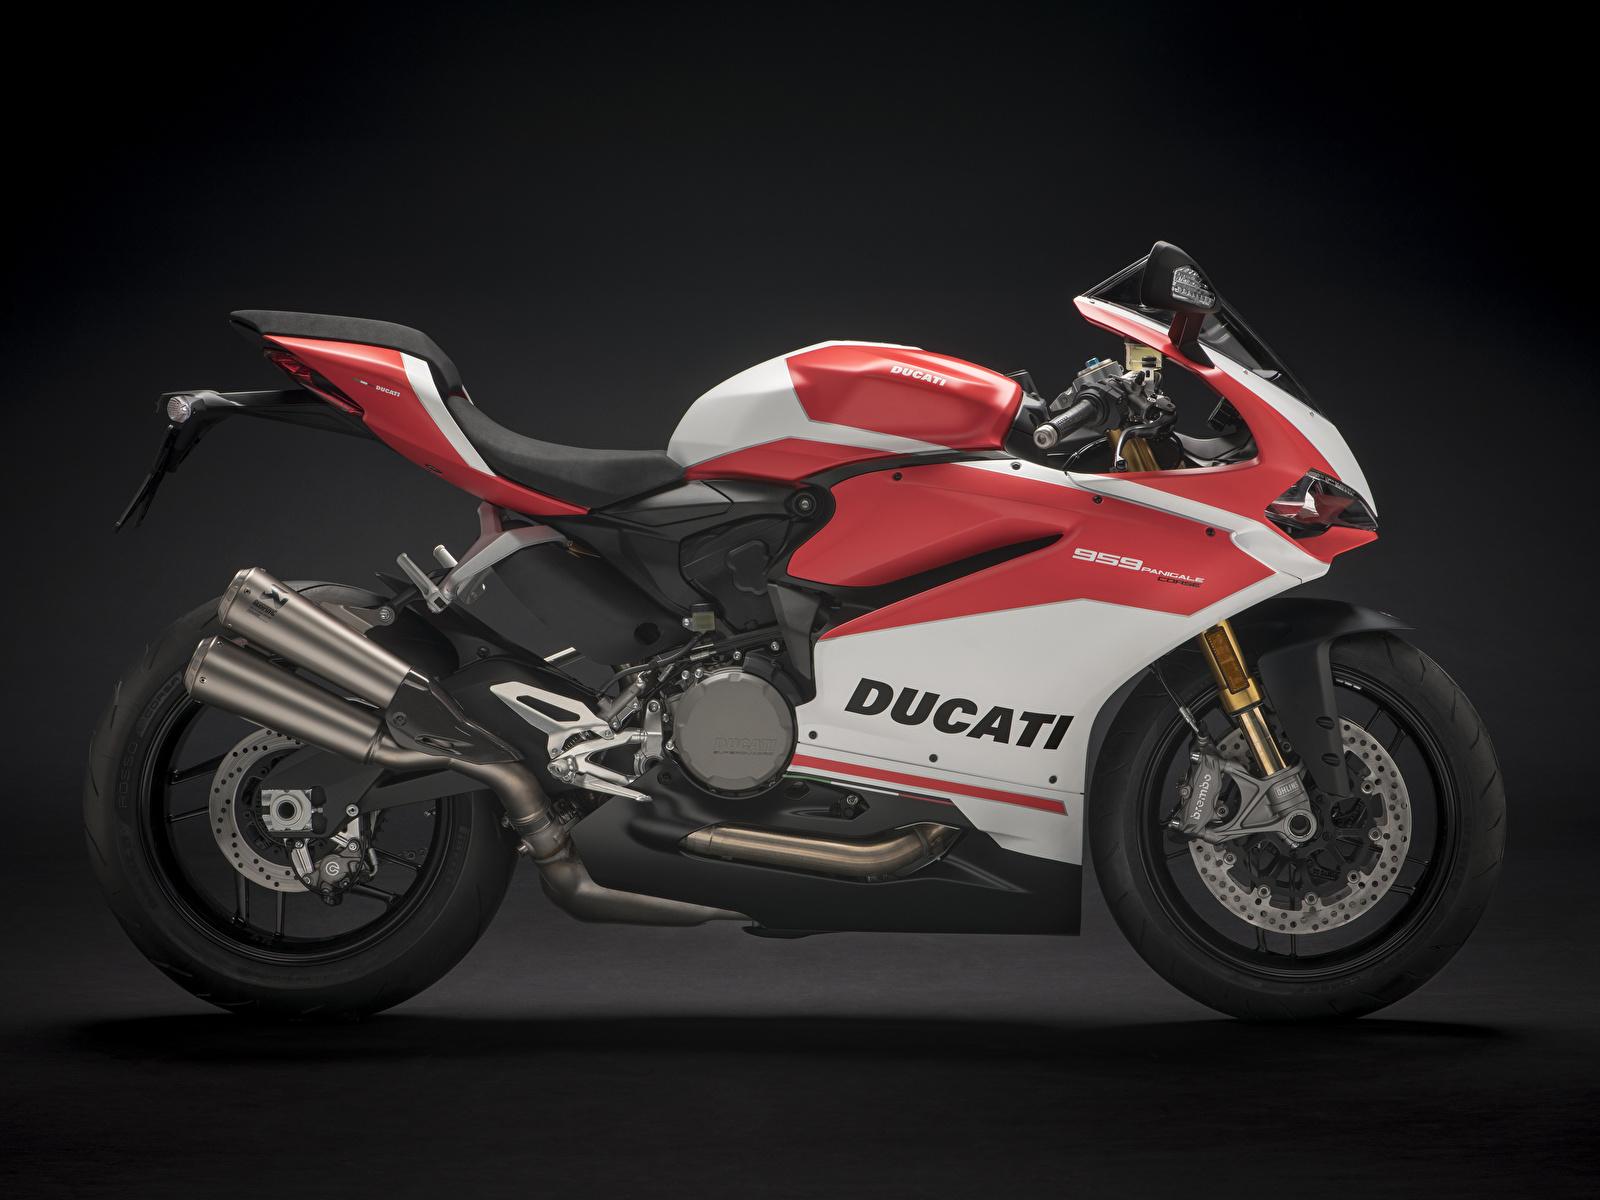 Фотография Дукати 2018 959 Panigale Corse Мотоциклы Сбоку на черном фоне 1600x1200 Ducati мотоцикл Черный фон